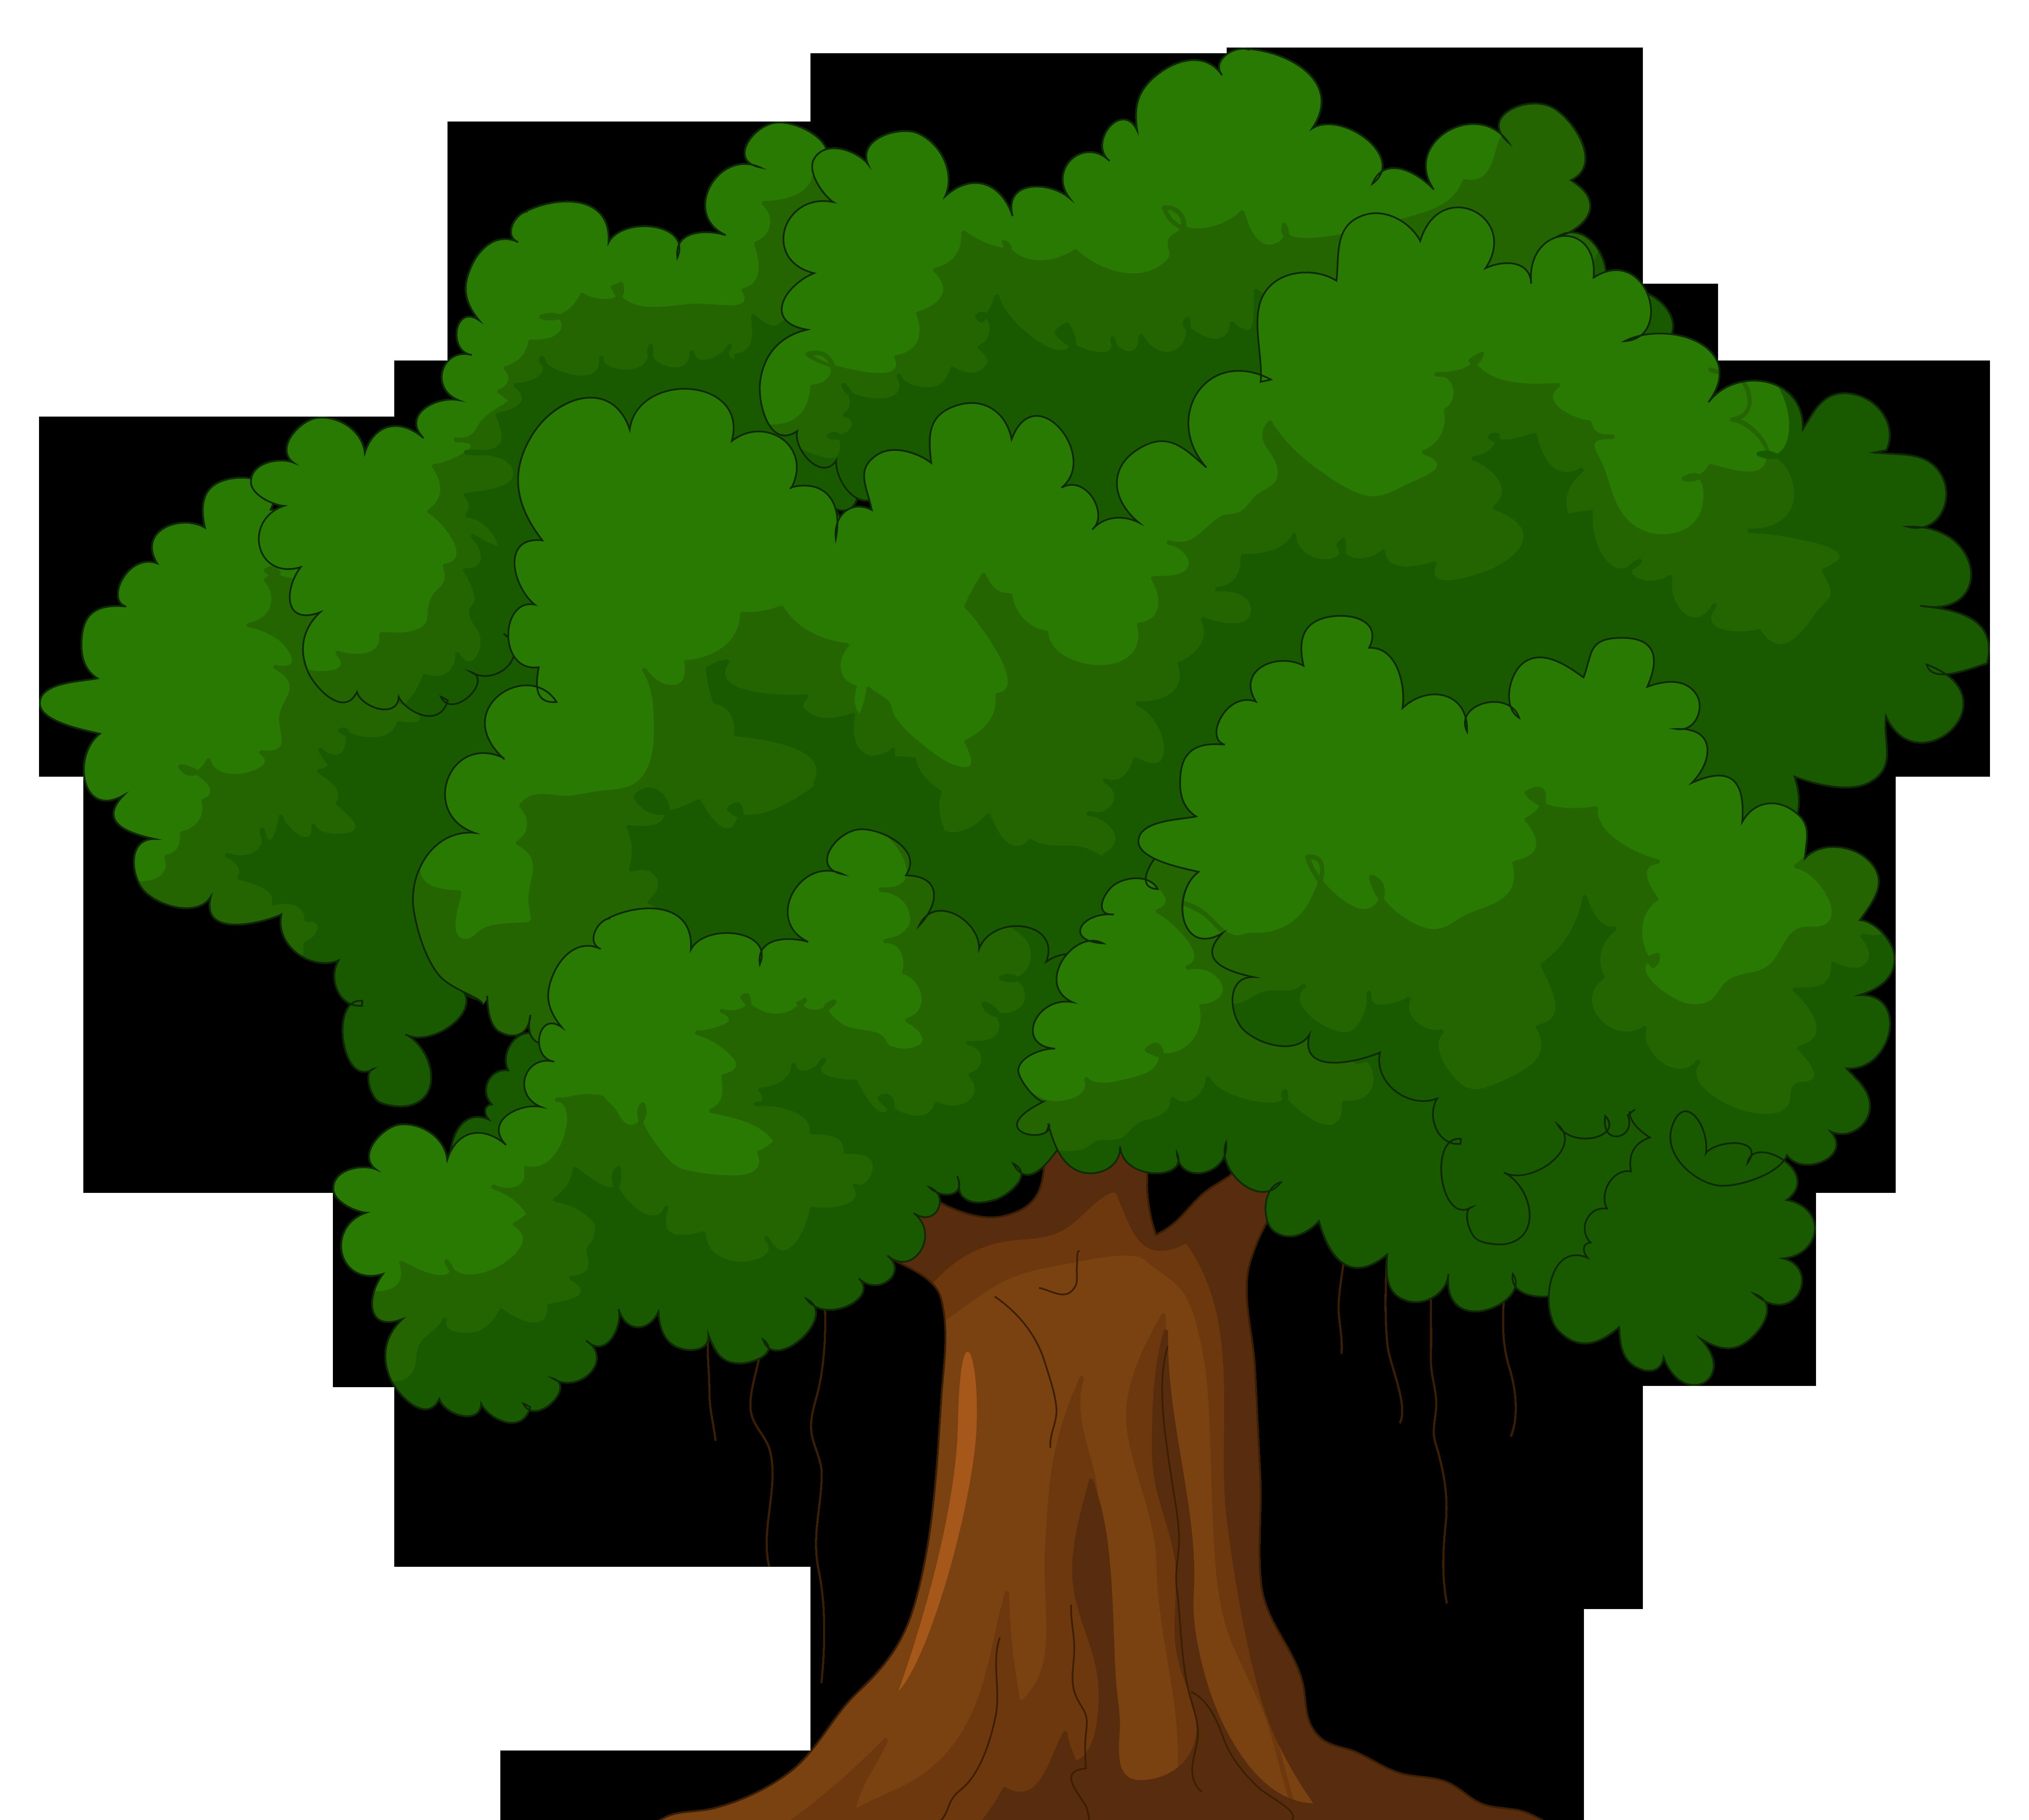 Cartoon green tree clipart web clipart-Cartoon green tree clipart web clipart-15